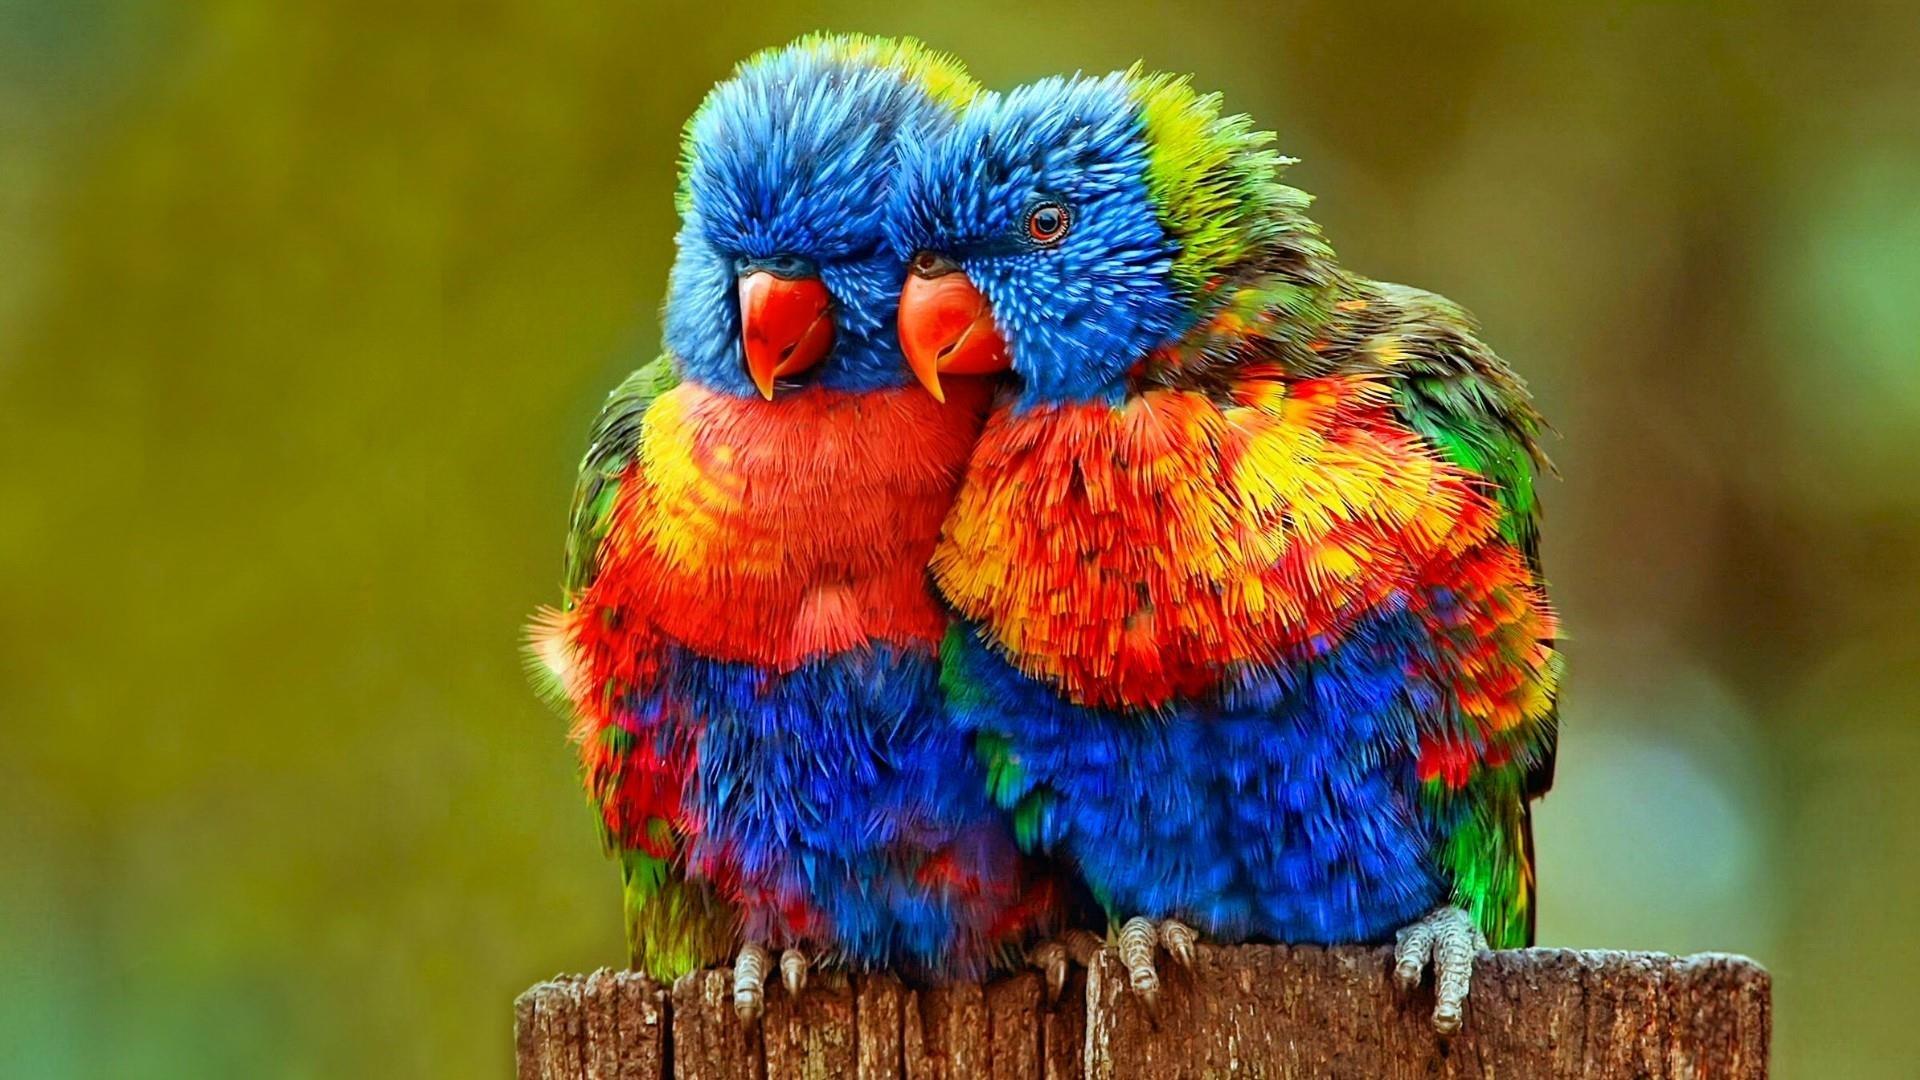 Colorful Bird best wallpaper